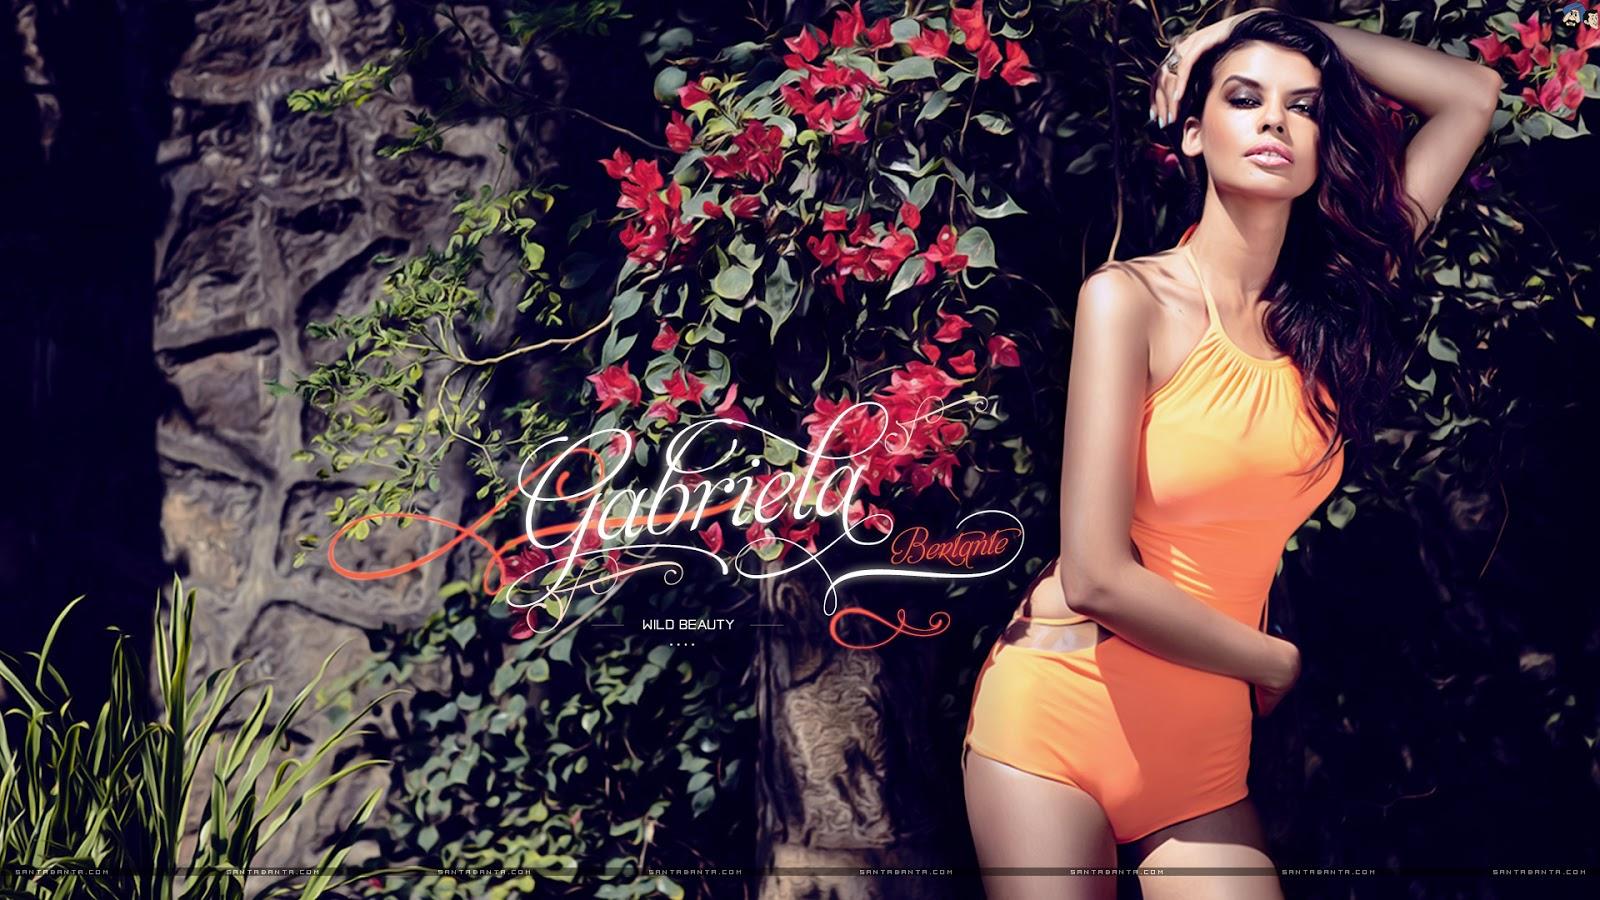 wallpapper gabriela bertante seducing sexy hot looks in orange bikini bra swimsuit